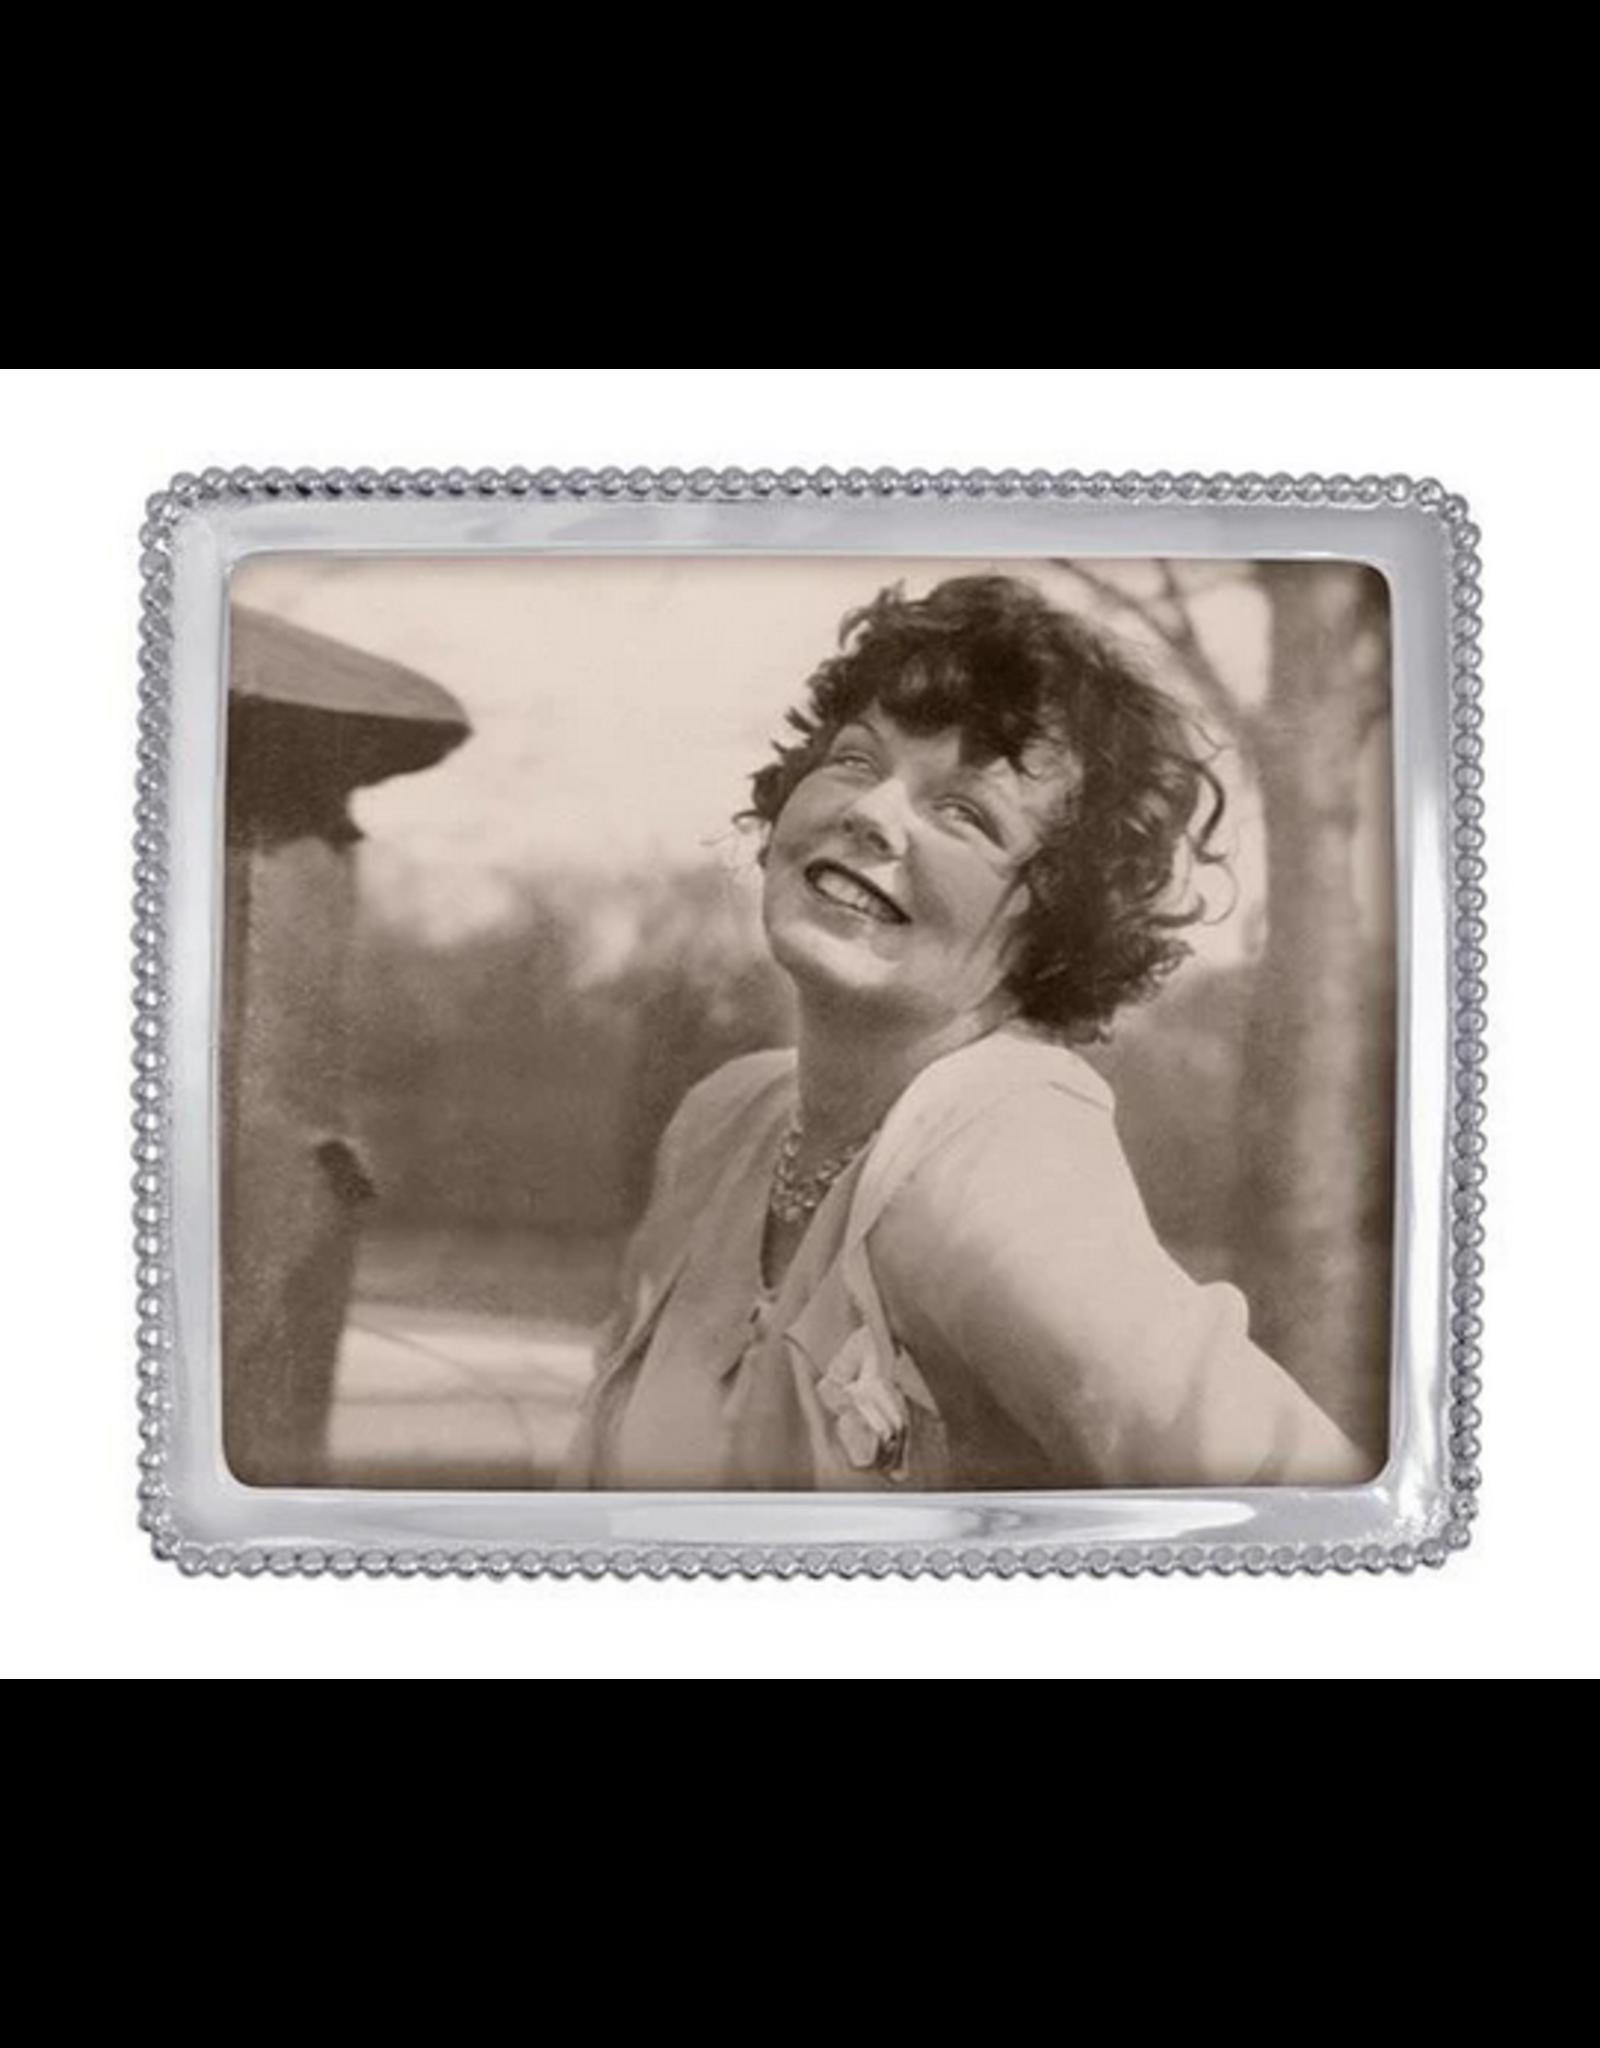 Mariposa Beaded 8x10 Frame